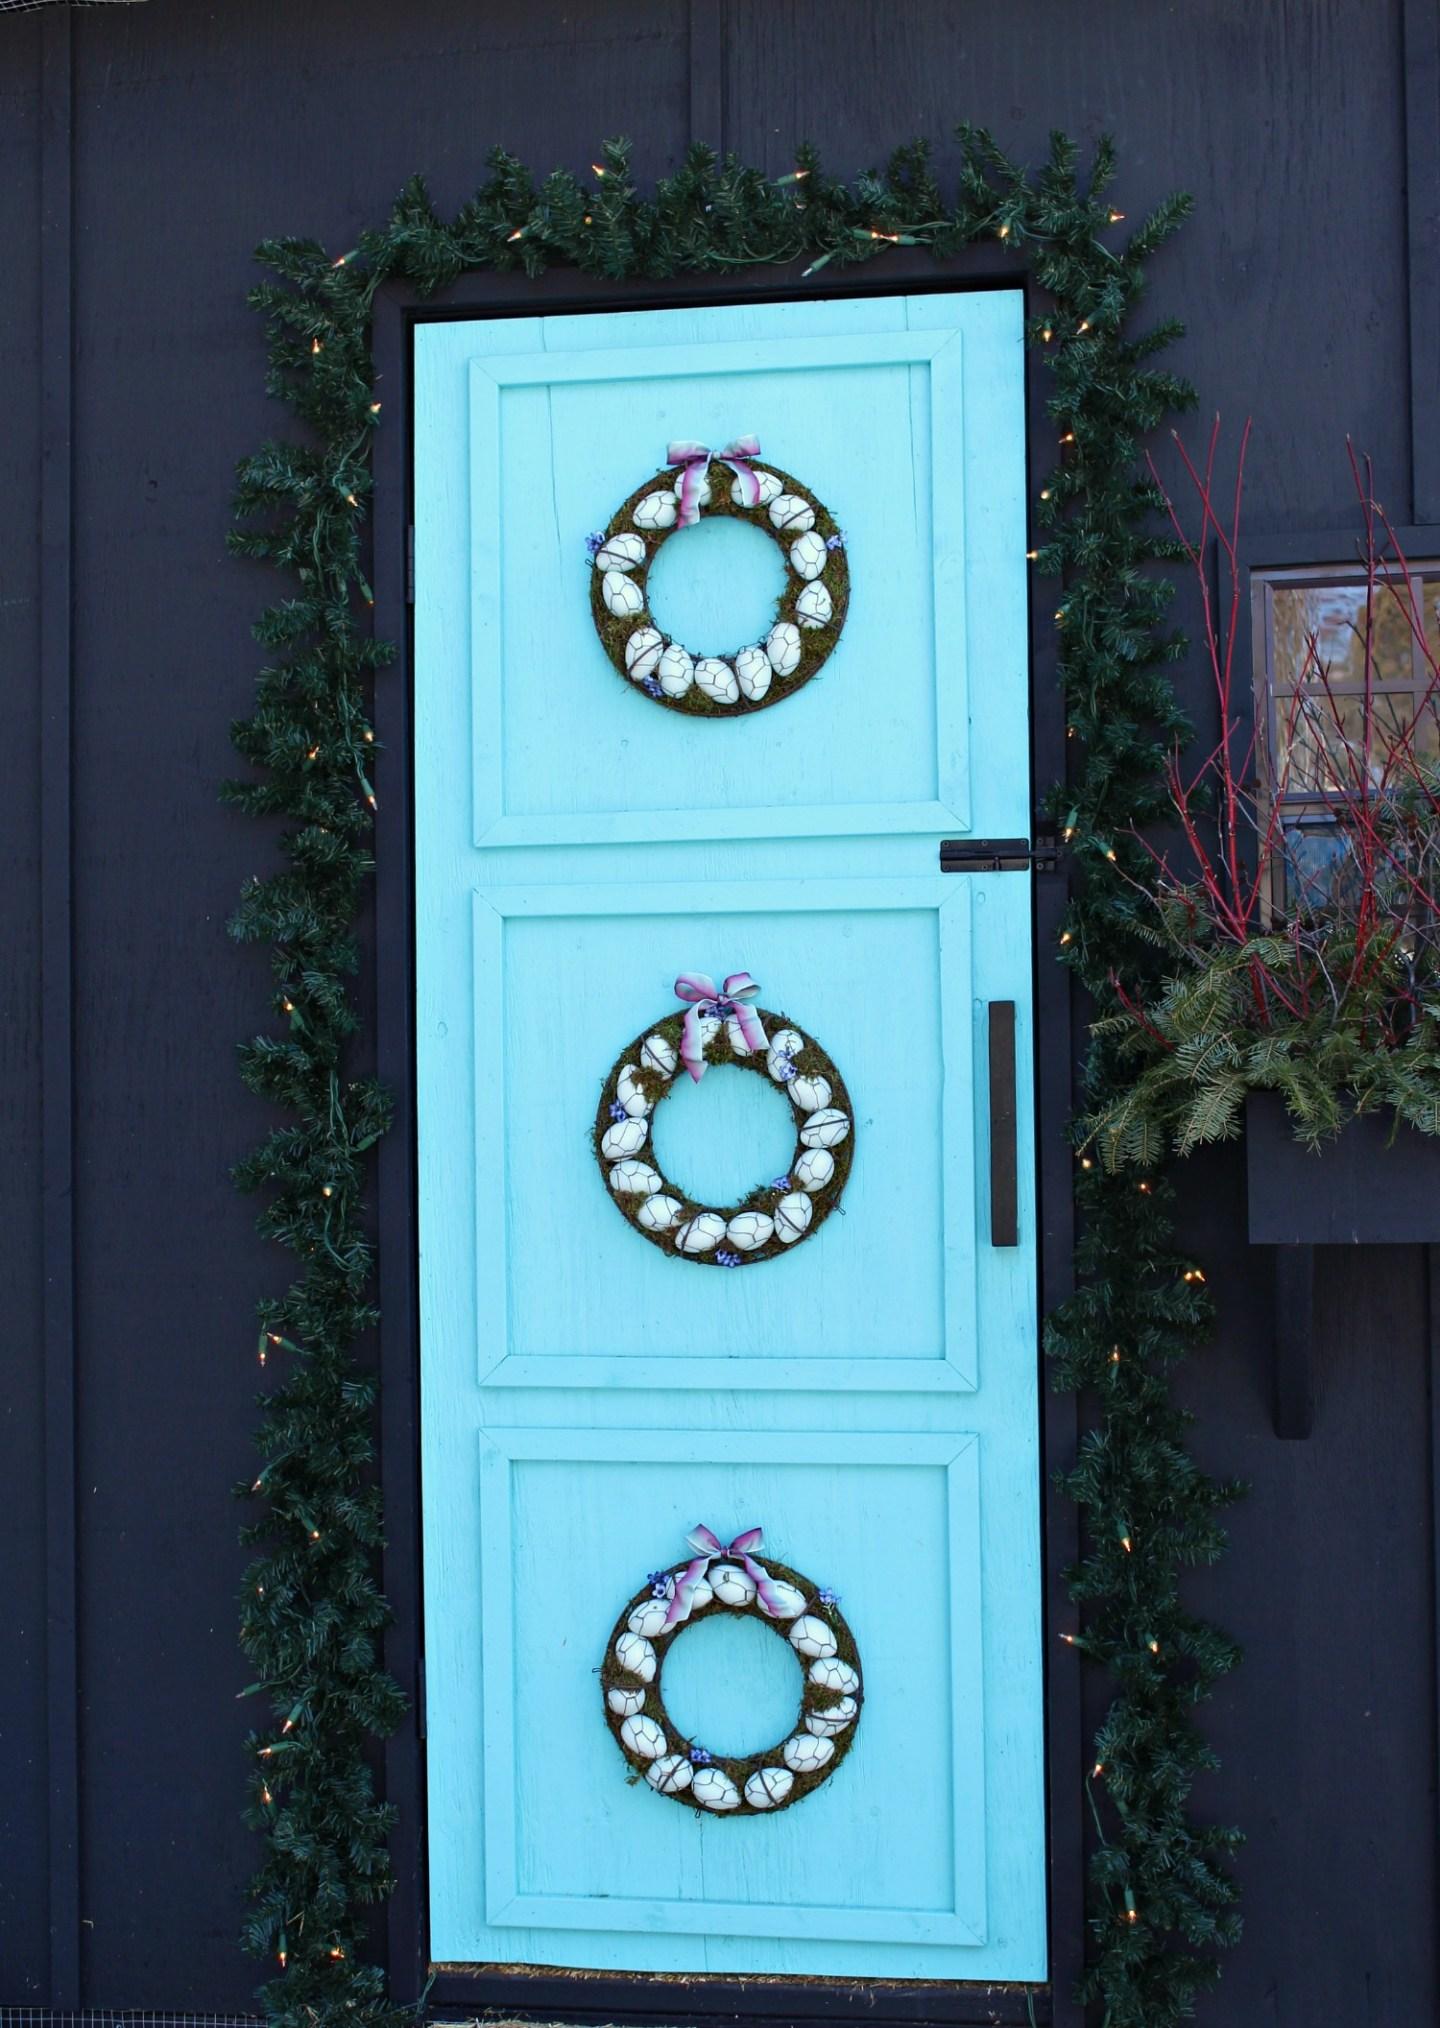 Turquoise Egg Wreath